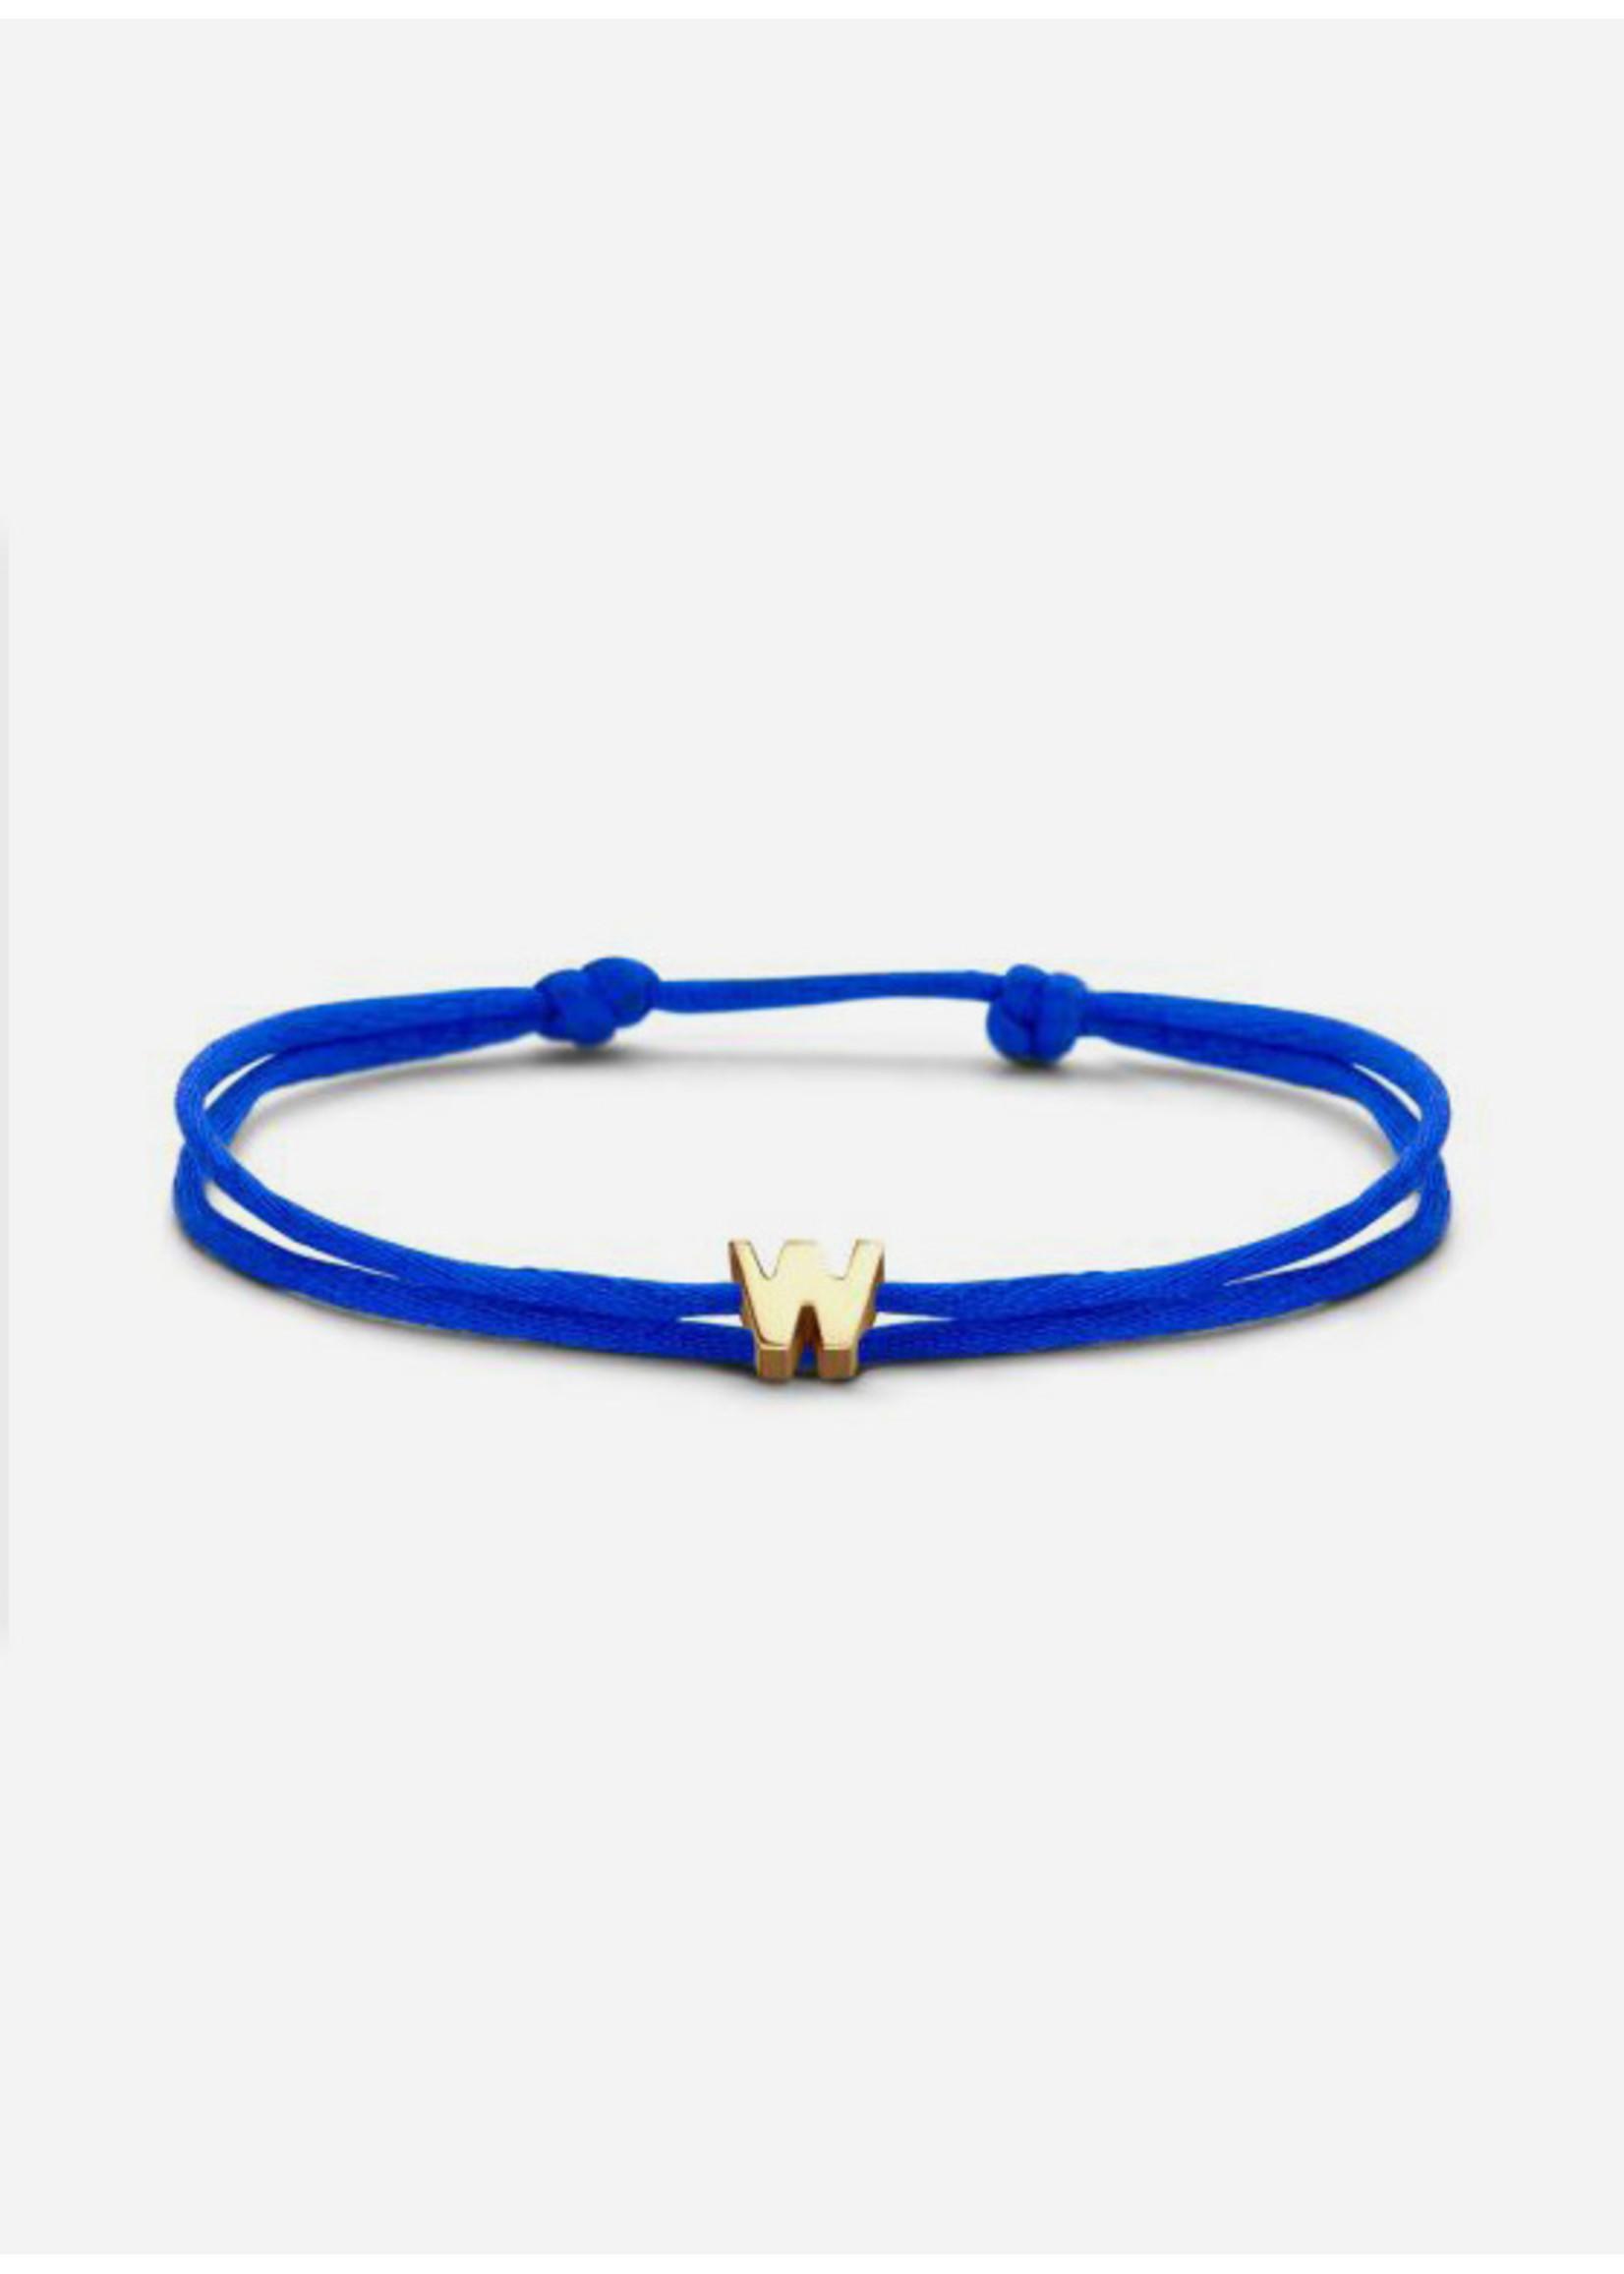 Just Franky Capital bracelet cord 1 capital